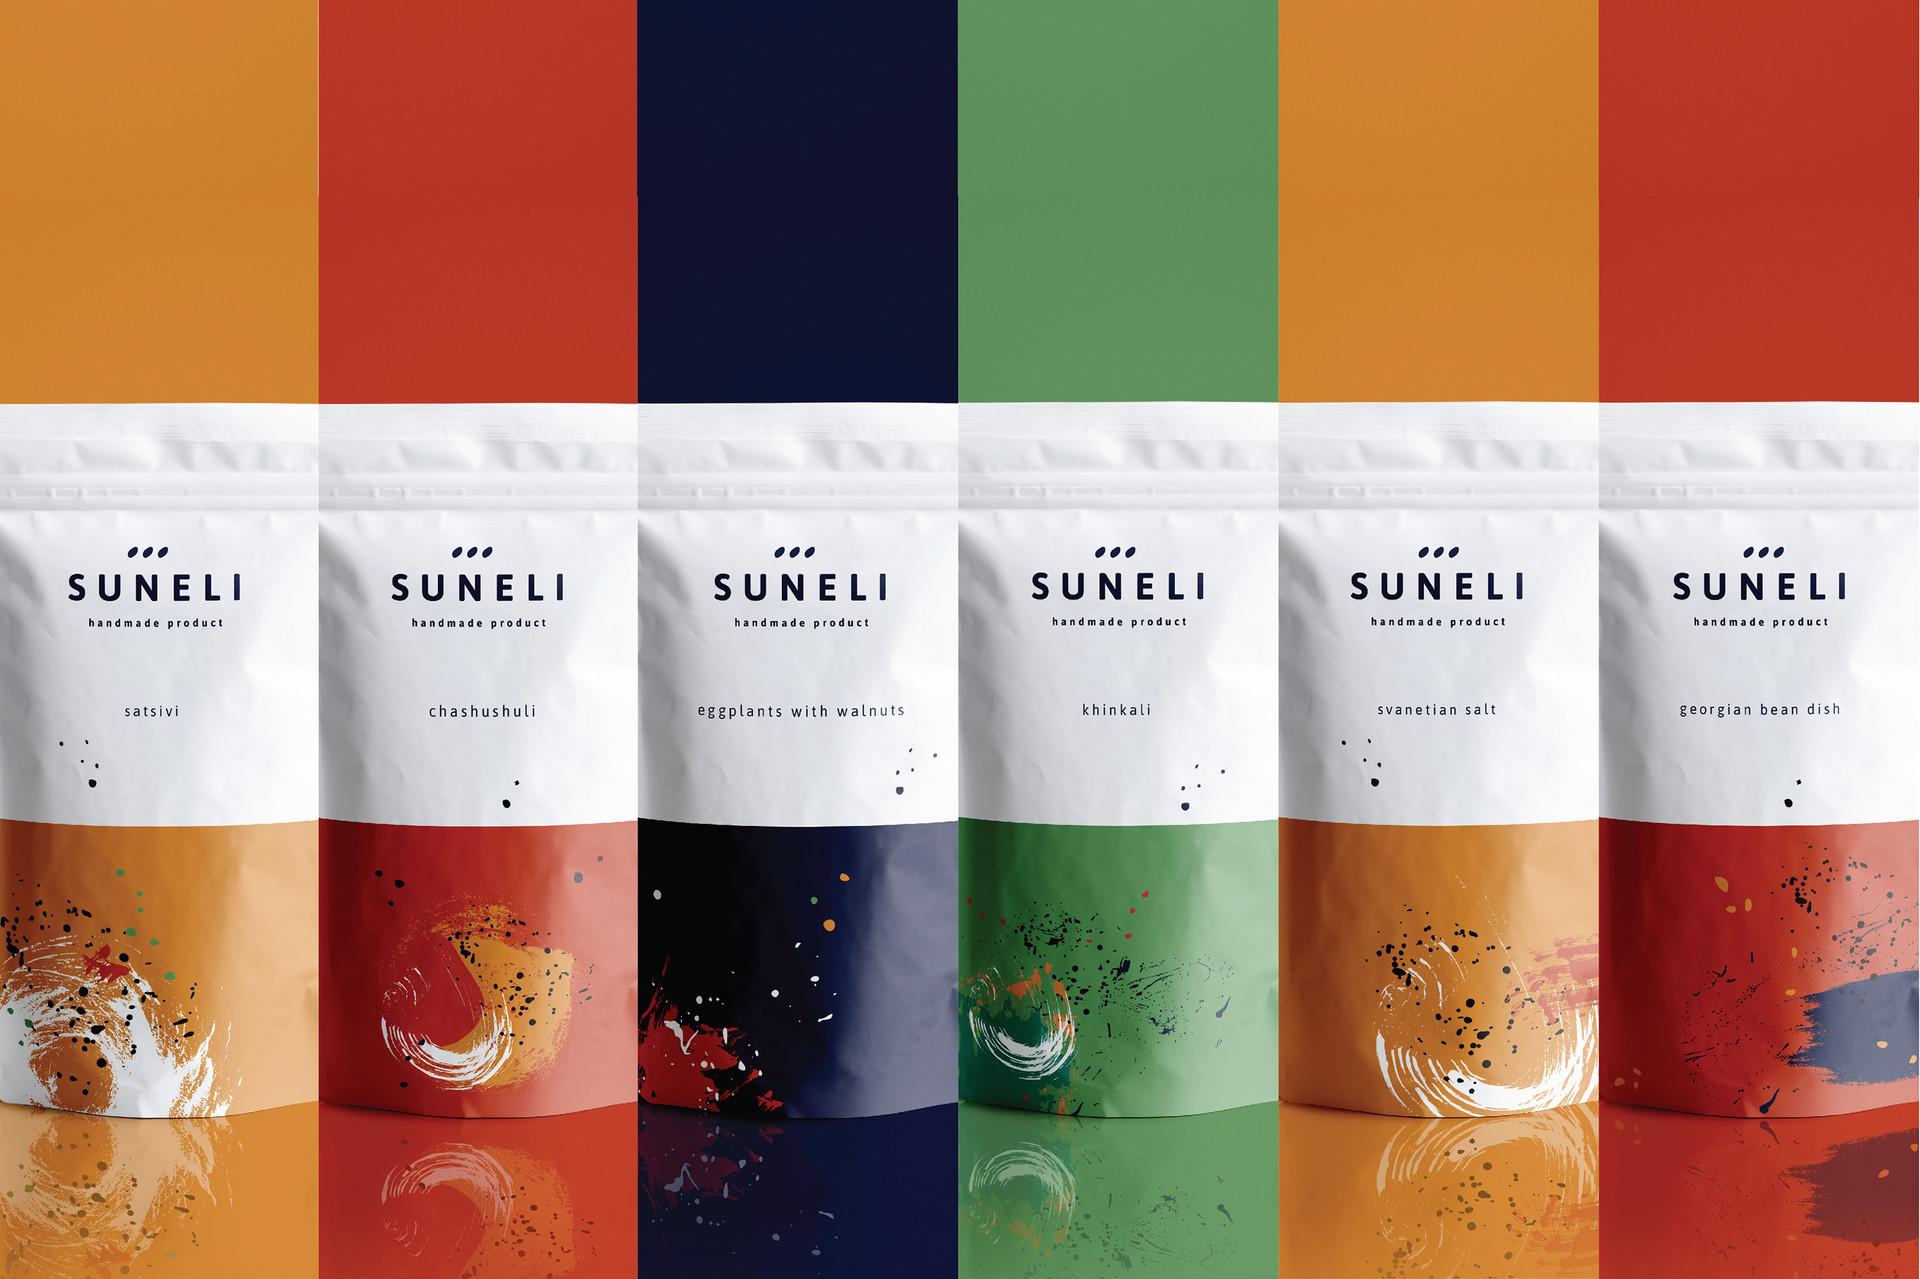 suneli - product variations